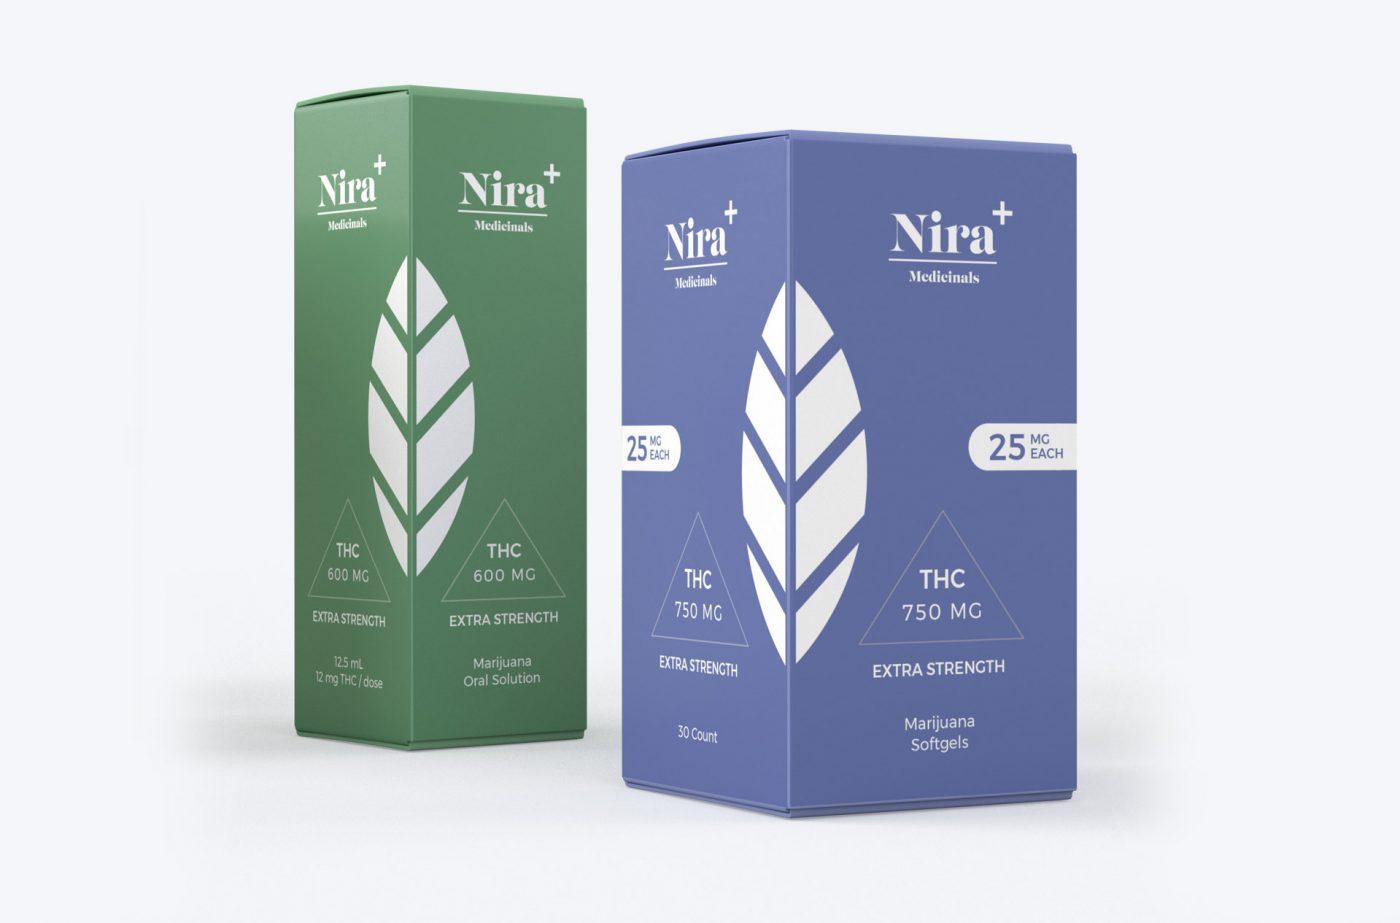 nira-plus-brand